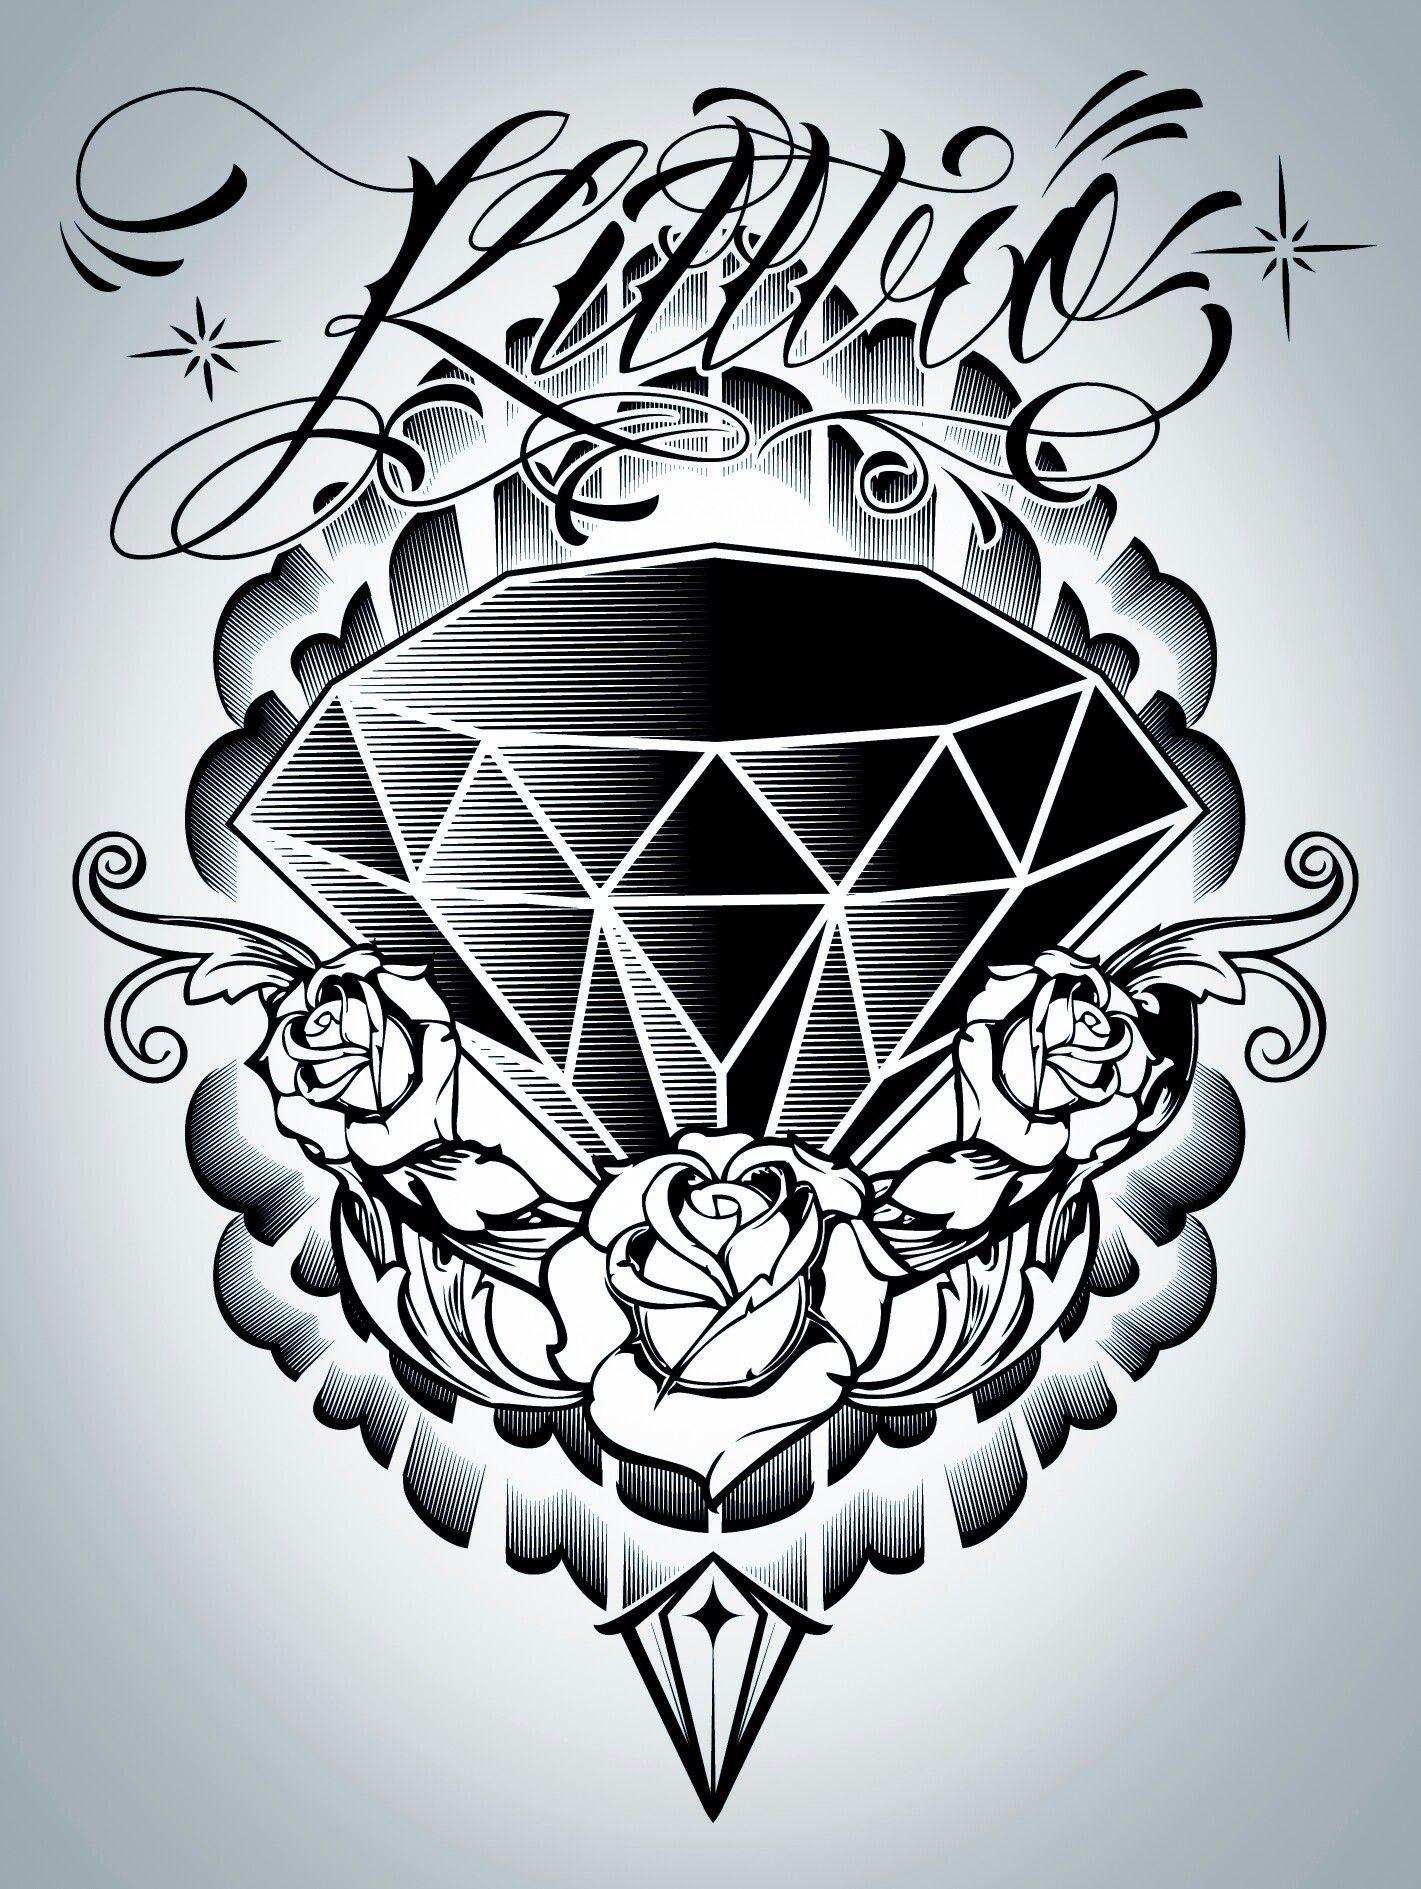 Pin By Nod 346 On Arte Cholero Worldwide Diamond Tattoo Designs Diamond Tattoos Tattoo Designs